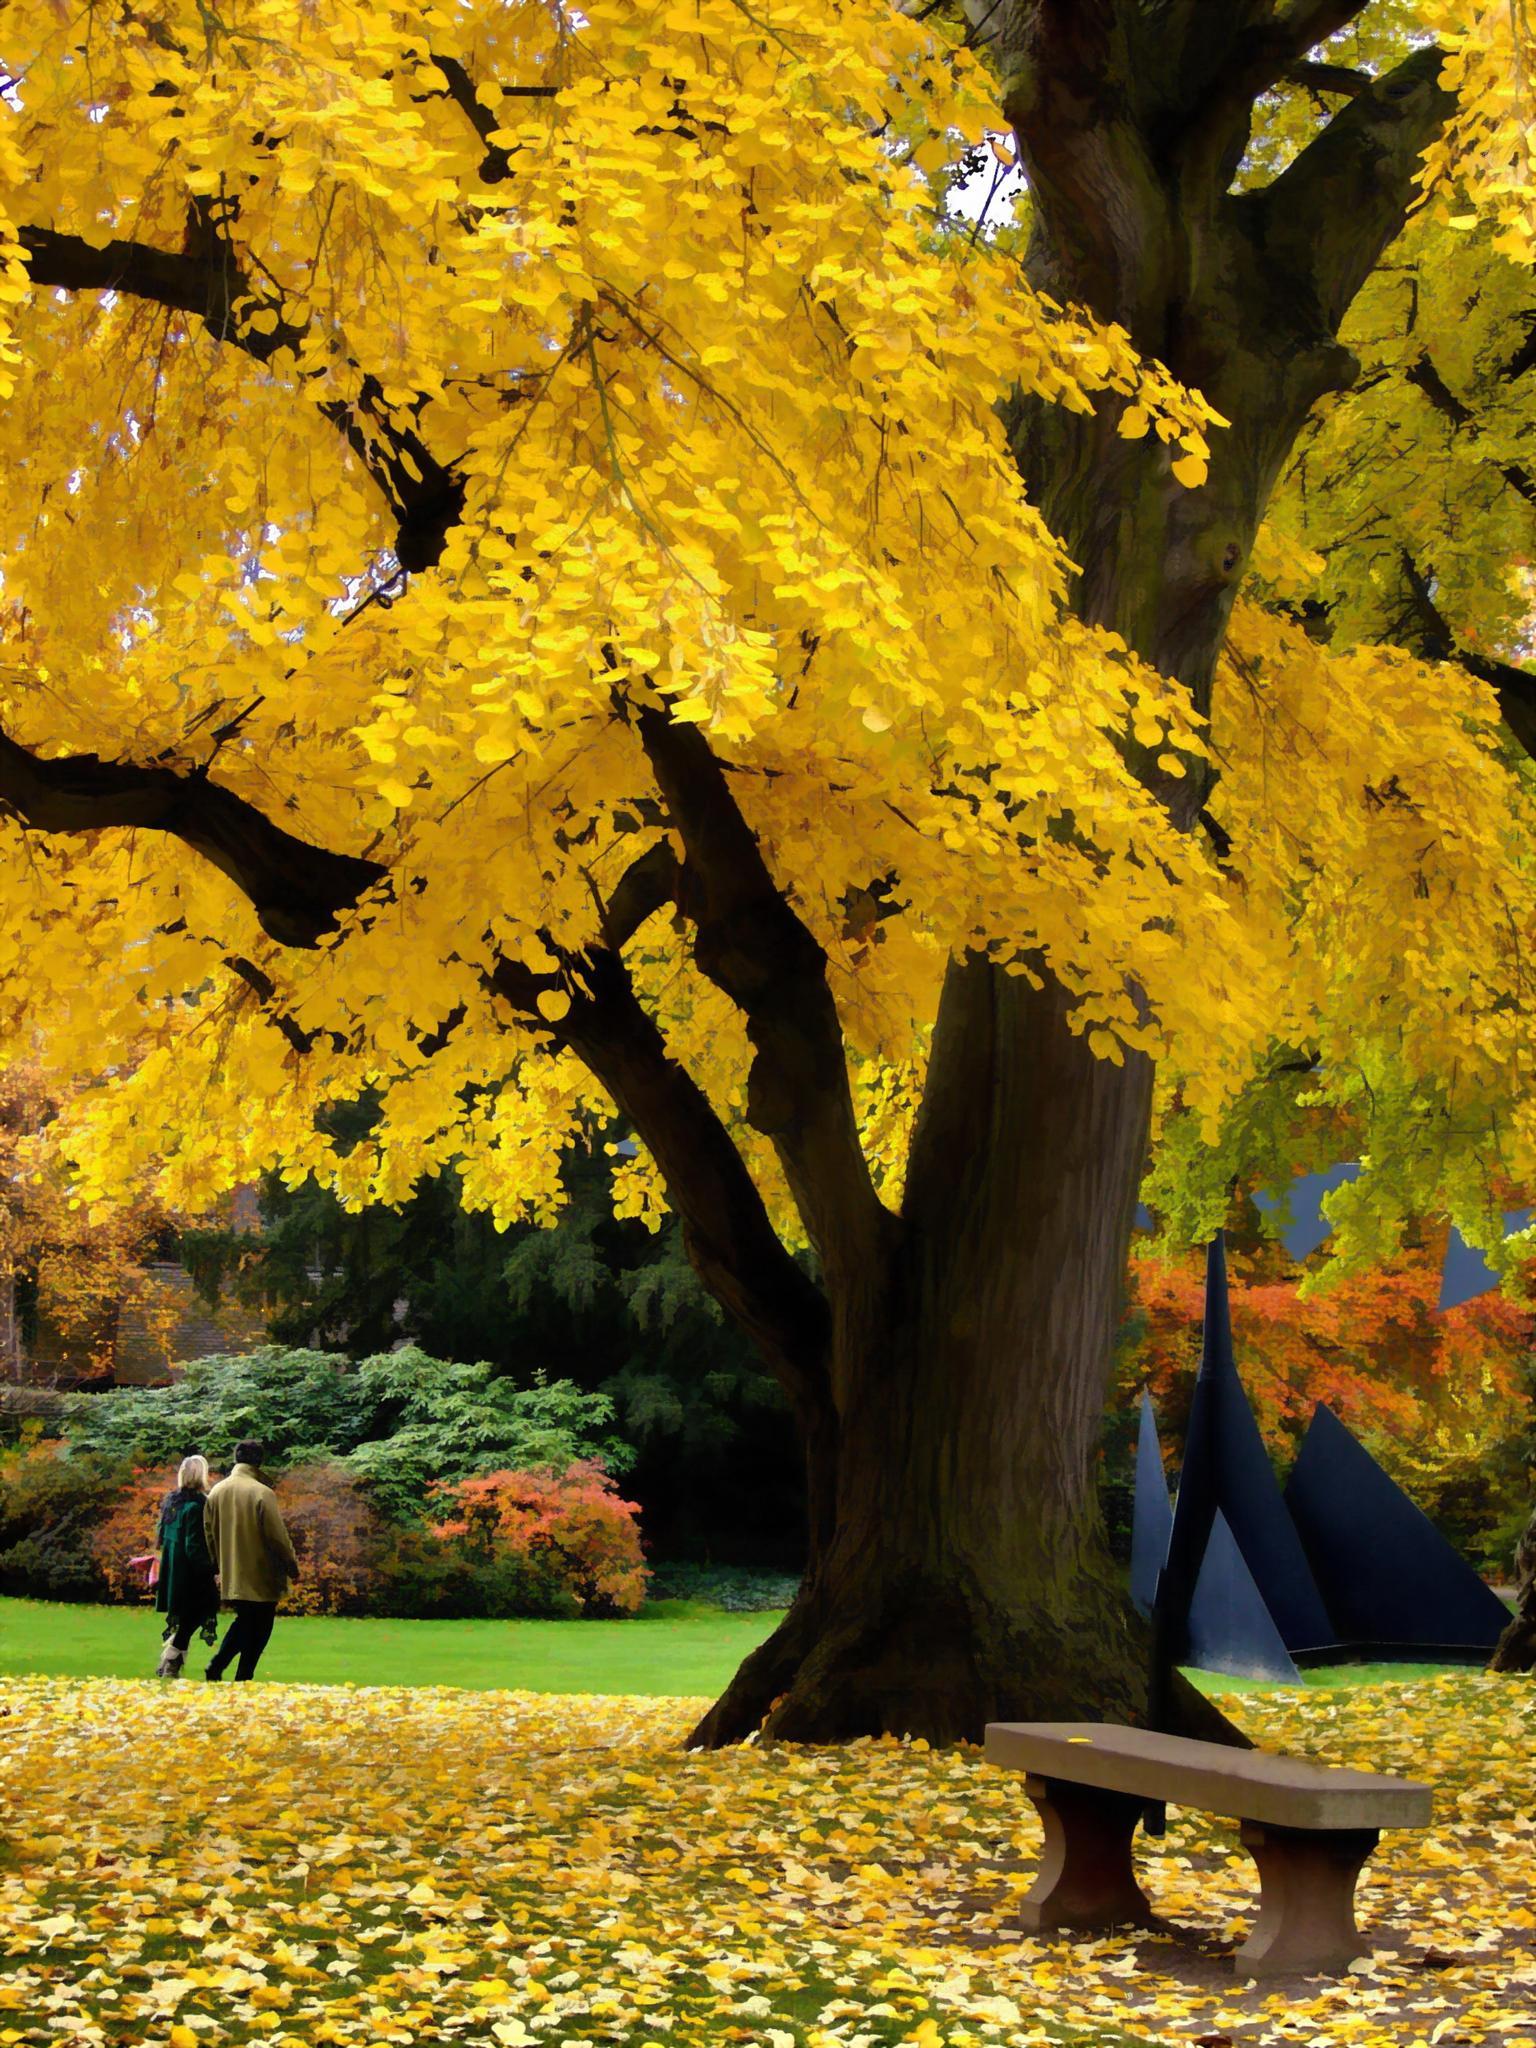 A Walk through the Park by Raymond Thill